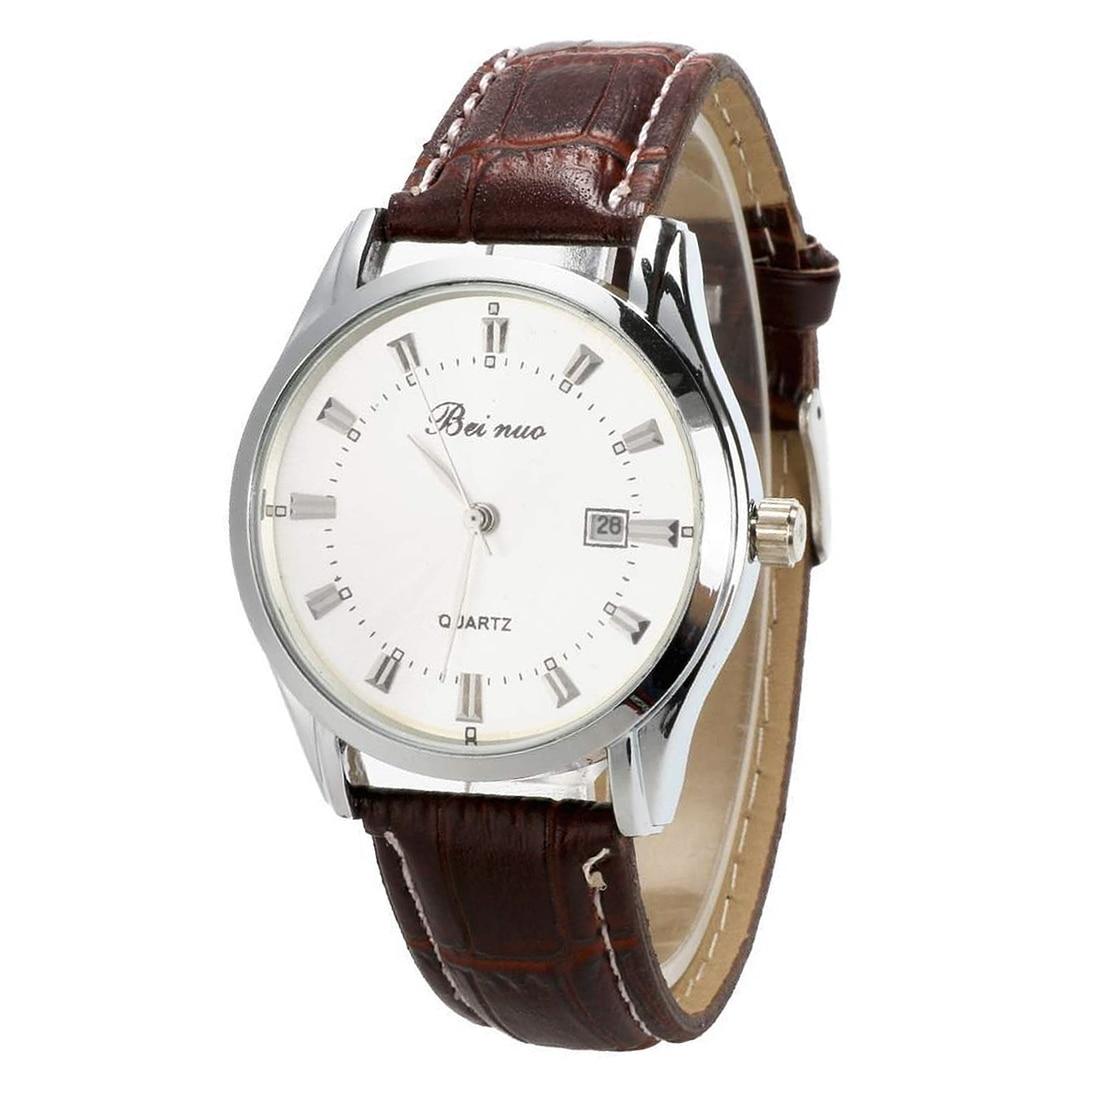 Beinuo Men Boy Sport Analog Quartz Alarm Auto Day Date Display Wrist Watch Leather band White+Coffee